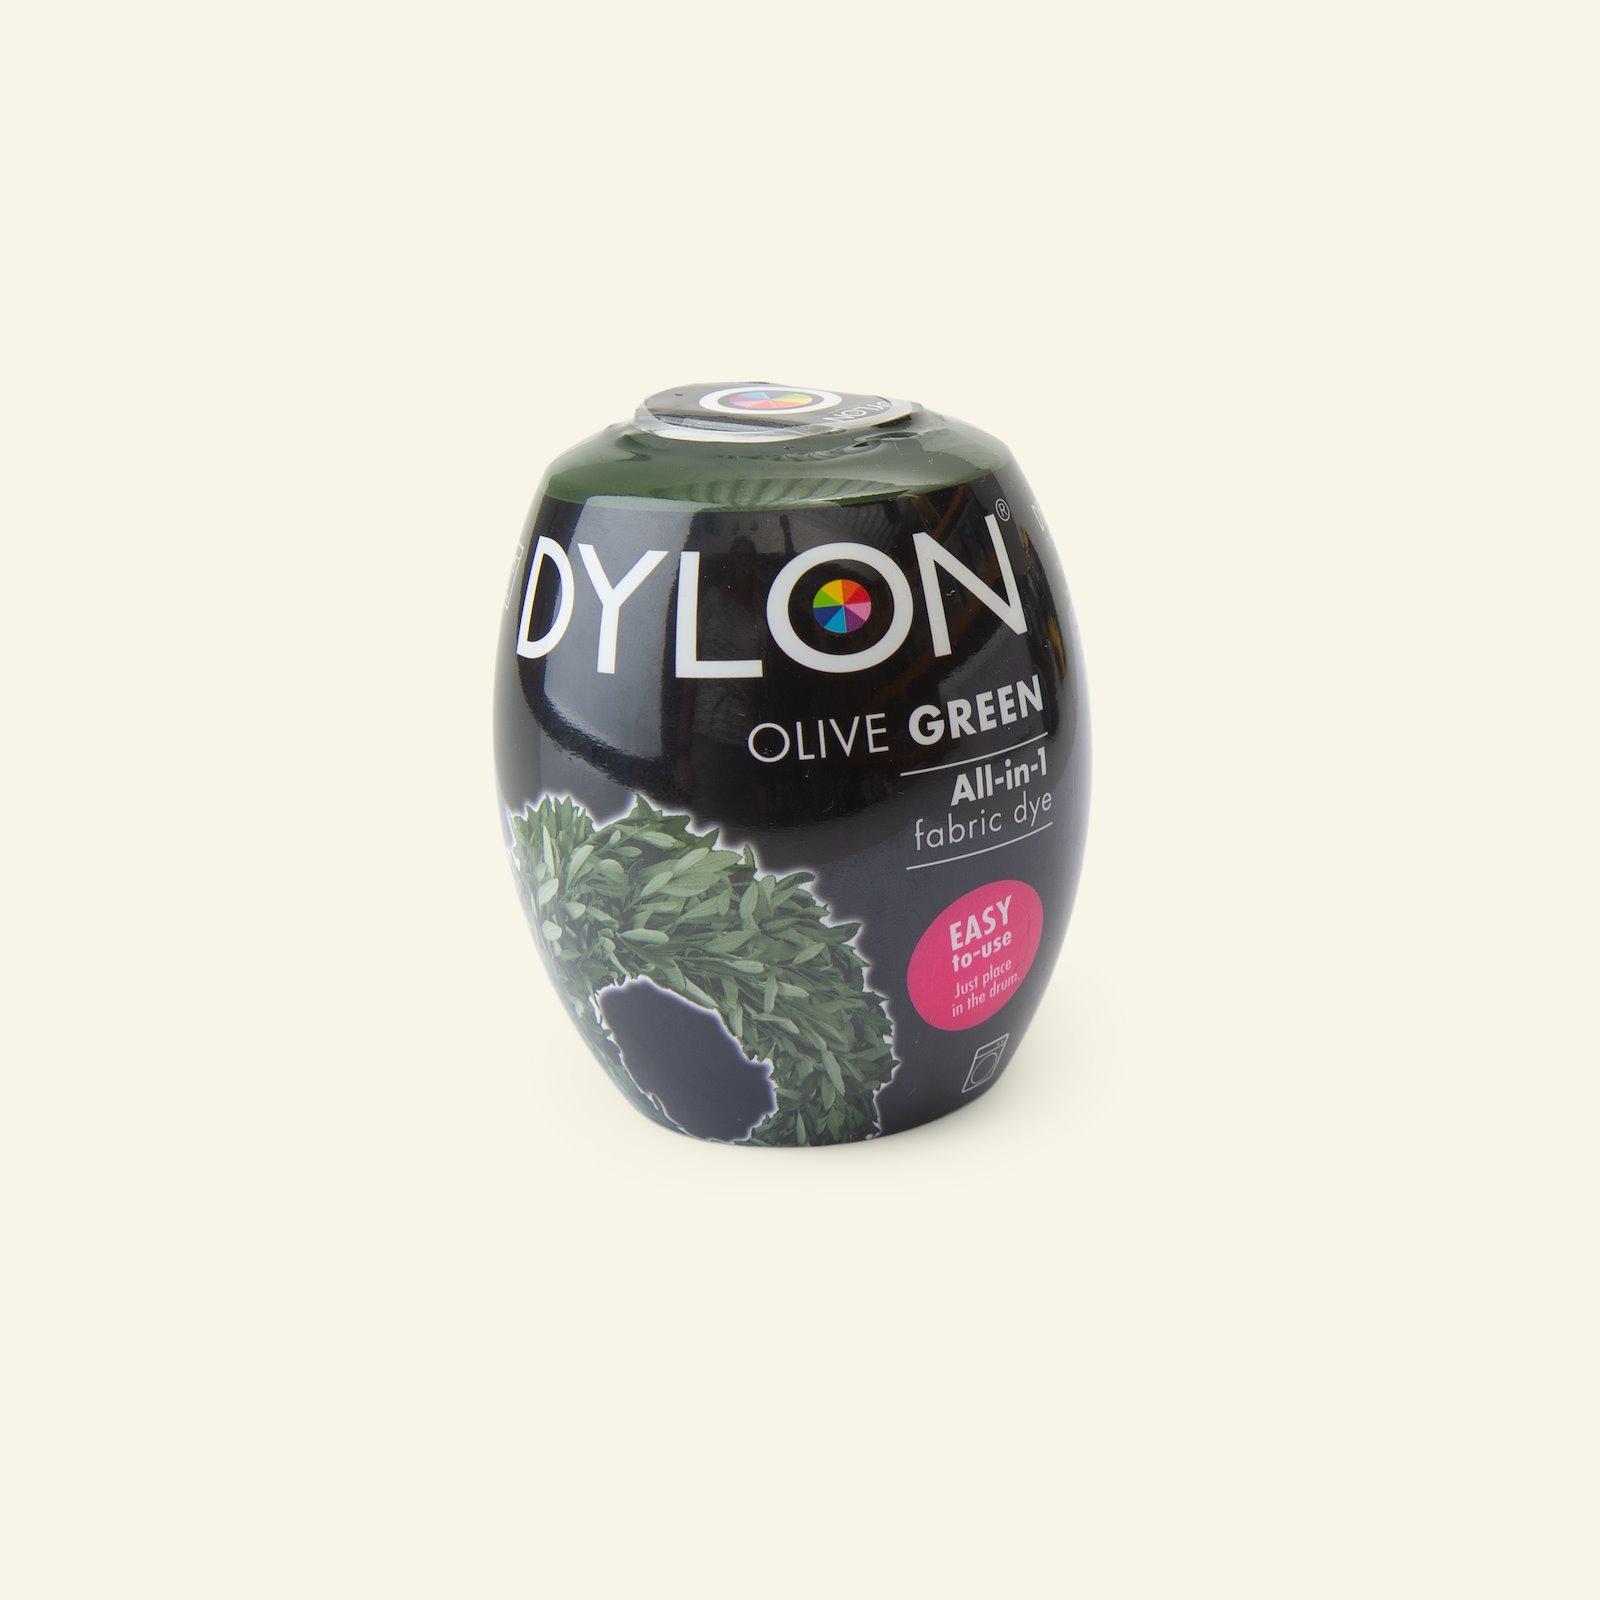 Dylon fabric dye for machine green 29709_pack_b